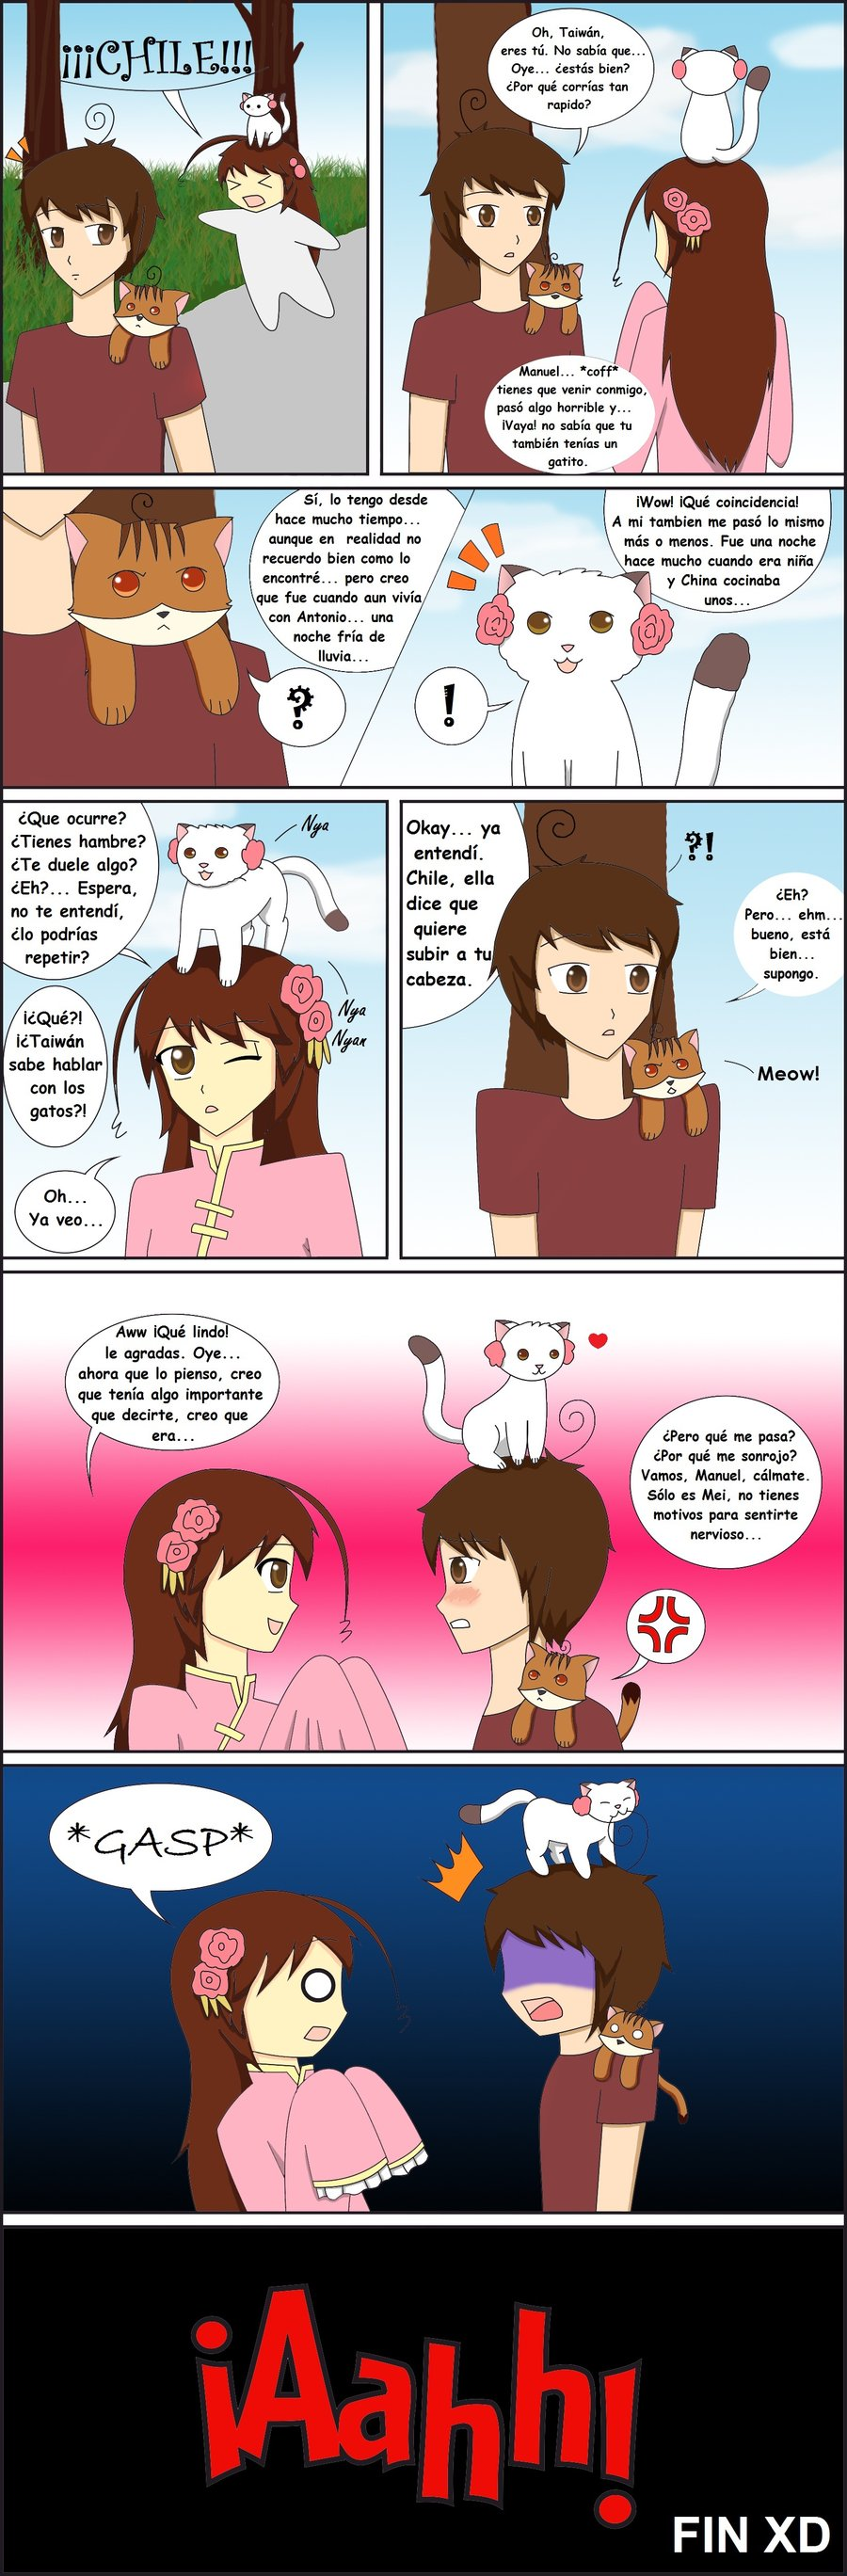 APH-HTRM comic: Bad Kitty by sayuri12moonlight.deviantart.com on @deviantART